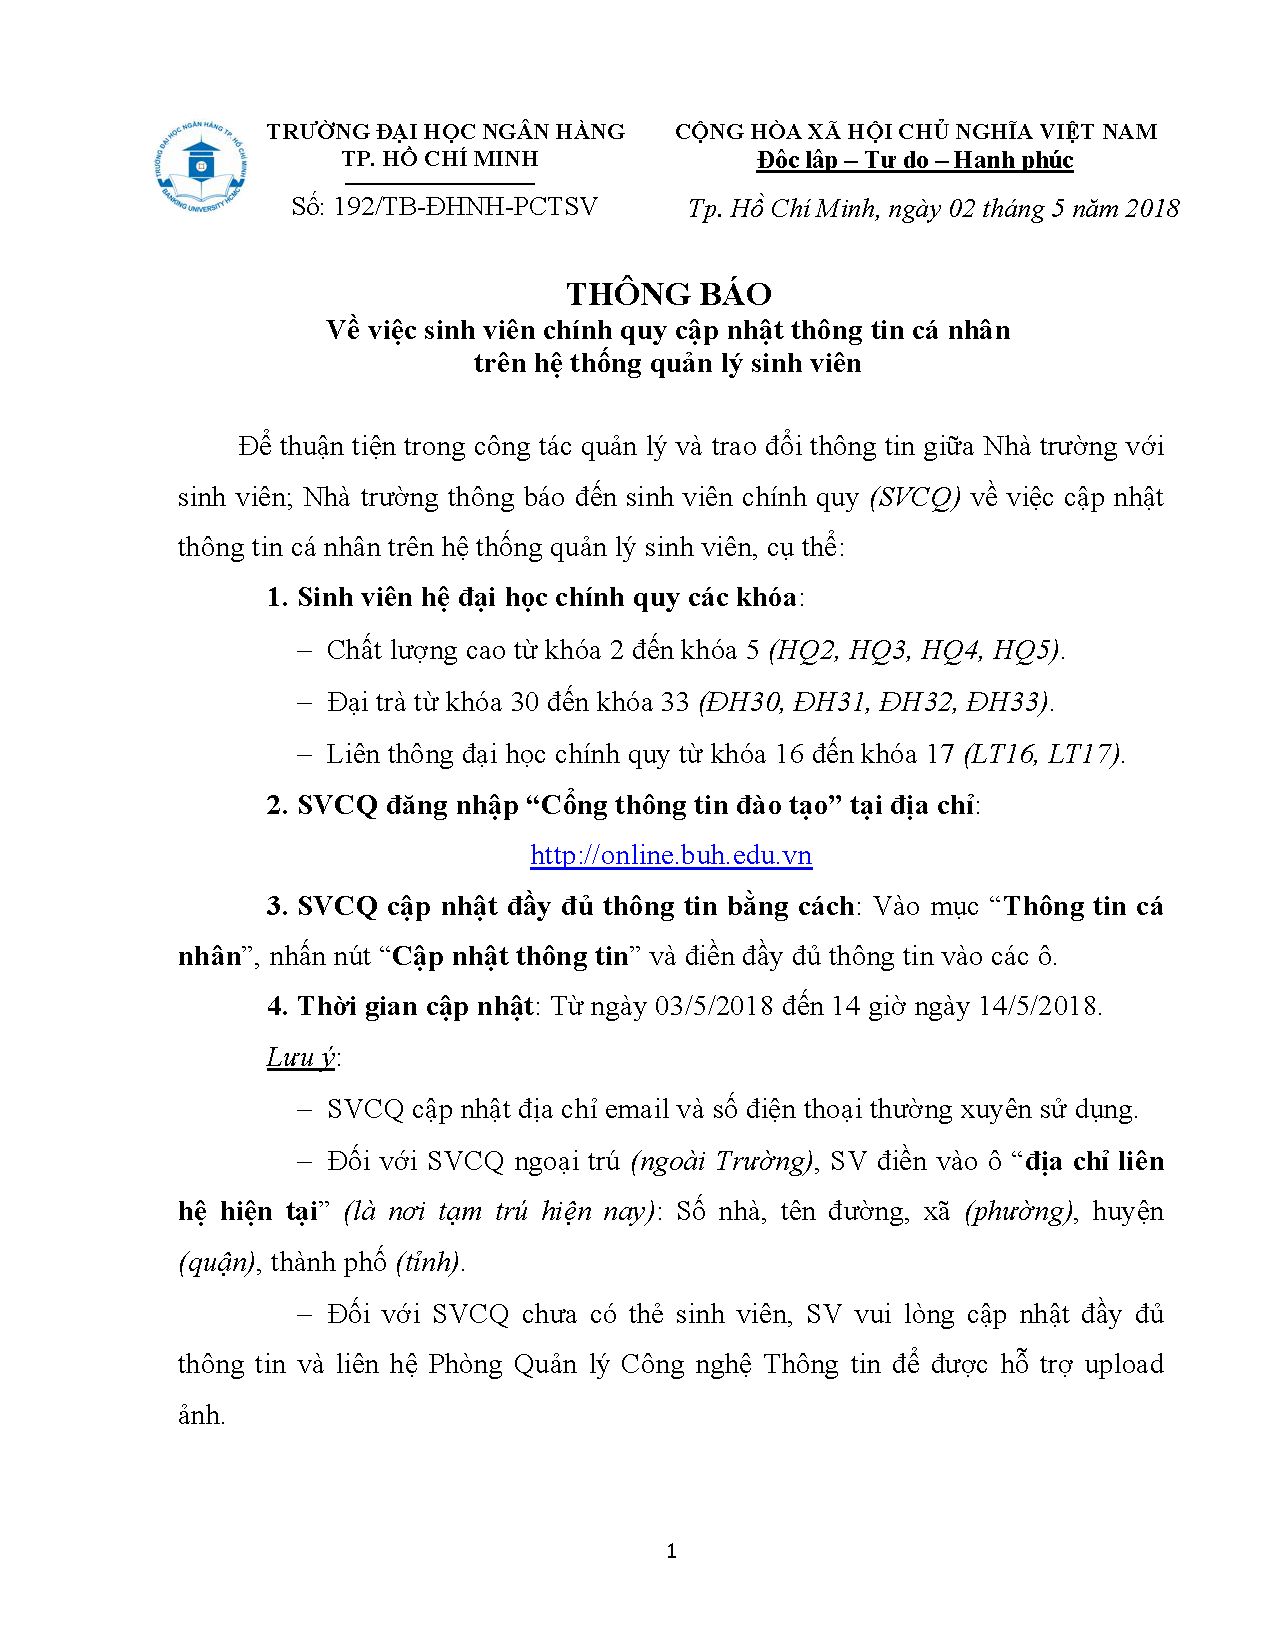 02.05.2018 - Thong bao ve viec SVCQ cap nhat thong tin ca nhan_Page_1